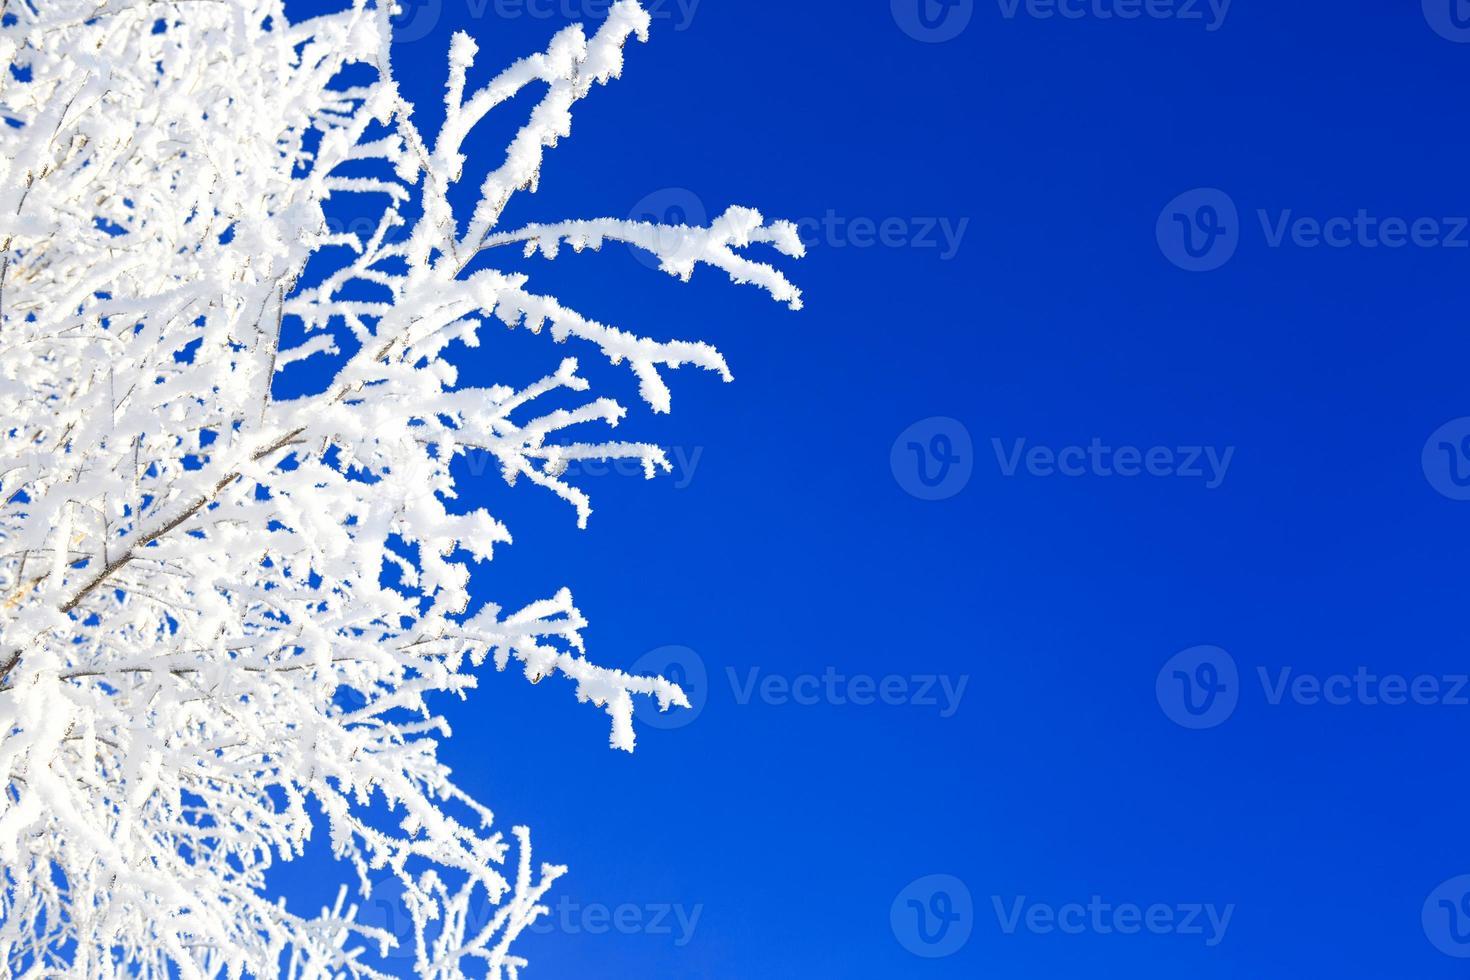 árvores de inverno no céu azul foto